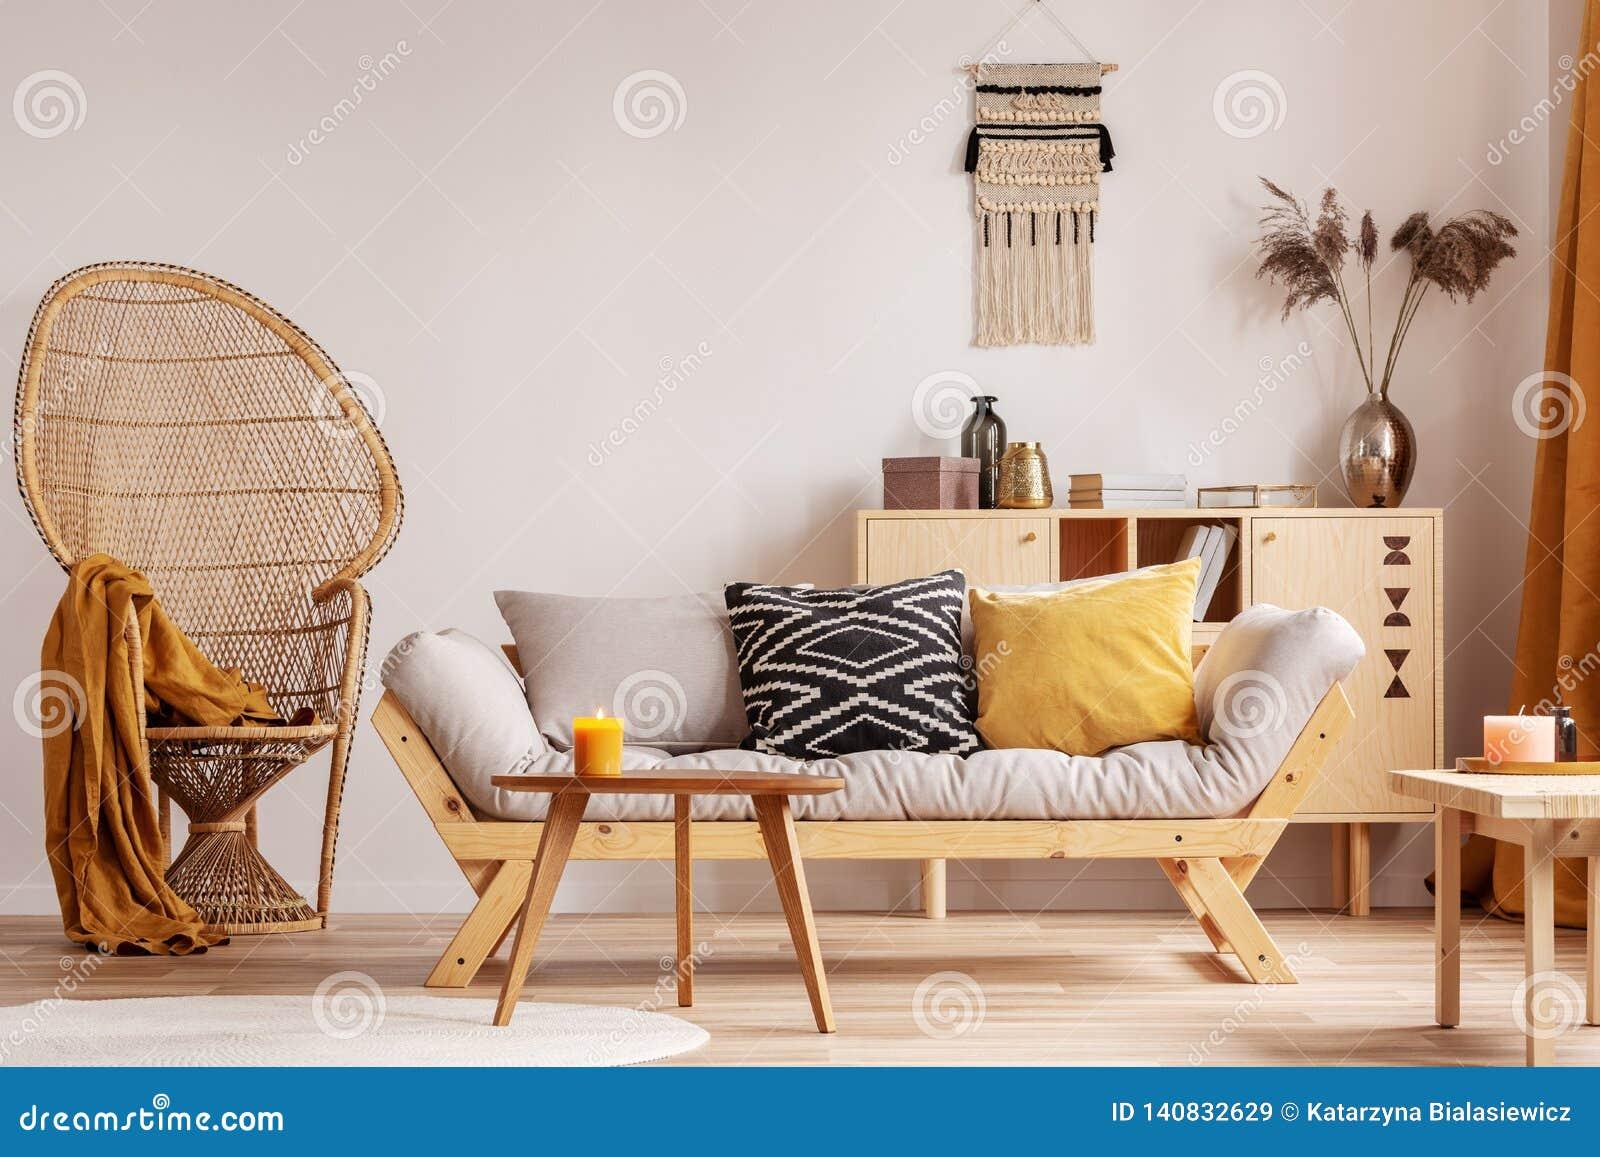 Wicker Peacock Chair In Elegant Living Room Interior Stock